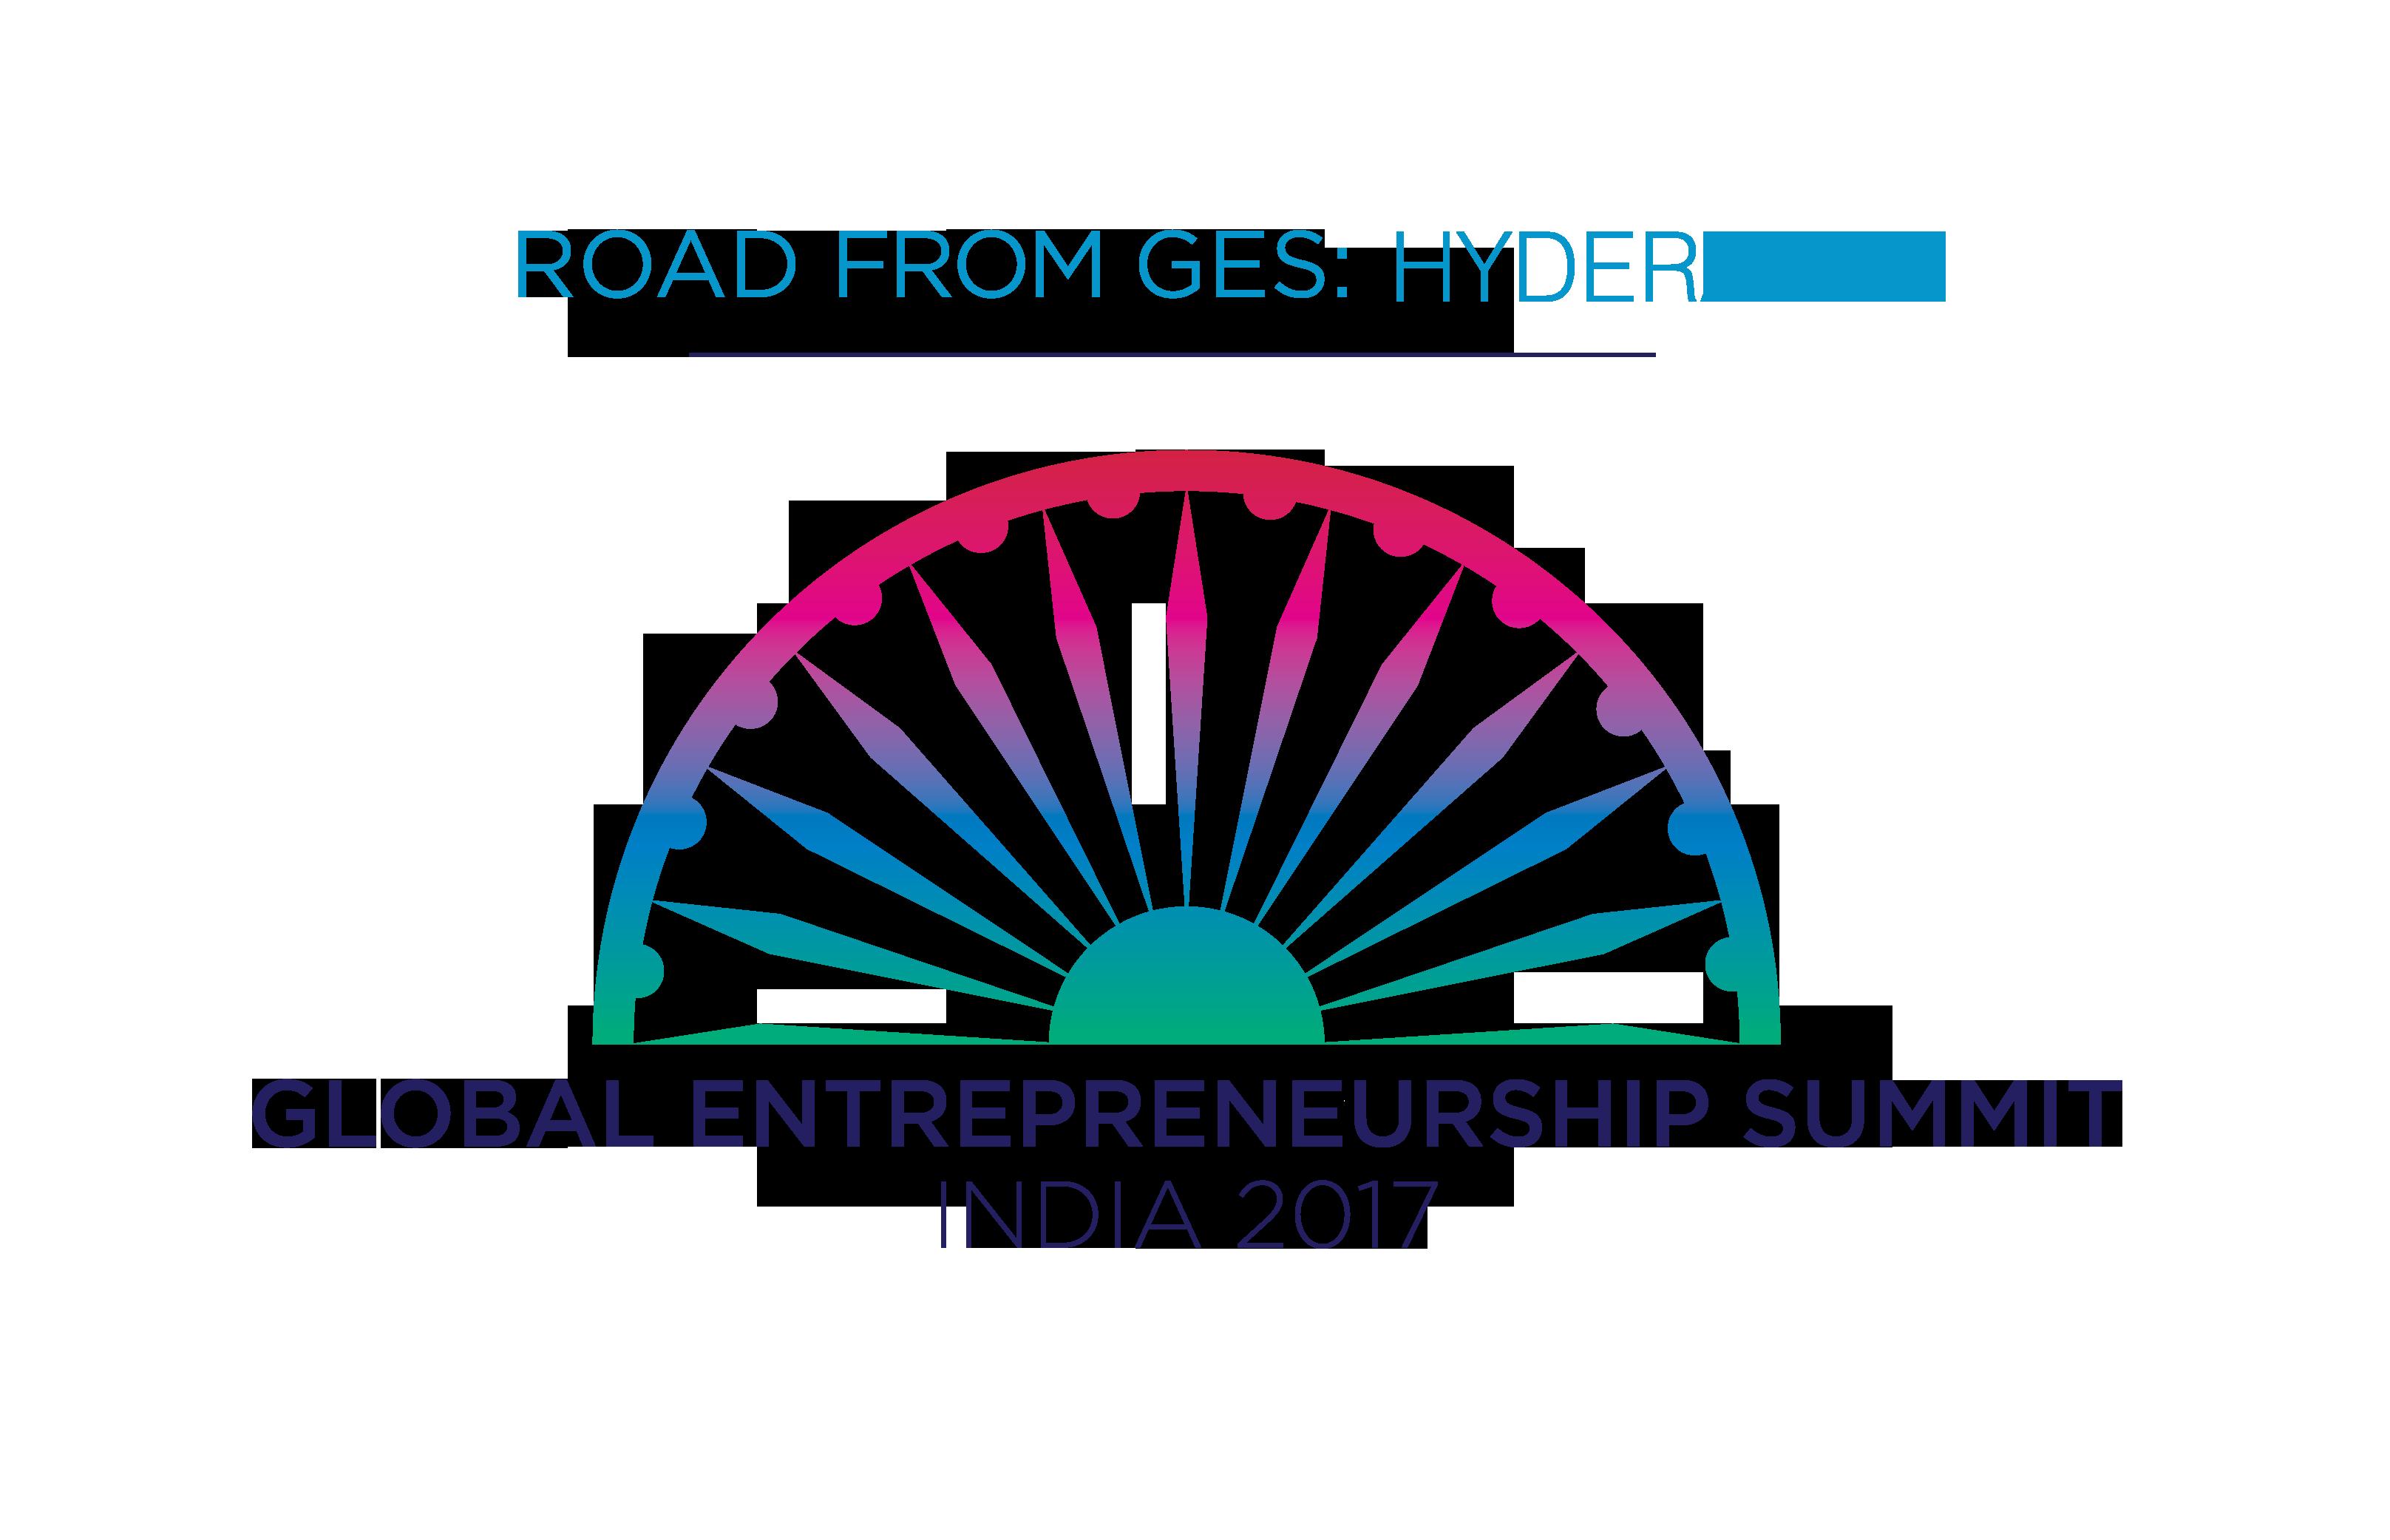 Book Unconvention|Speaker Series: Hyderabad - Celebrating